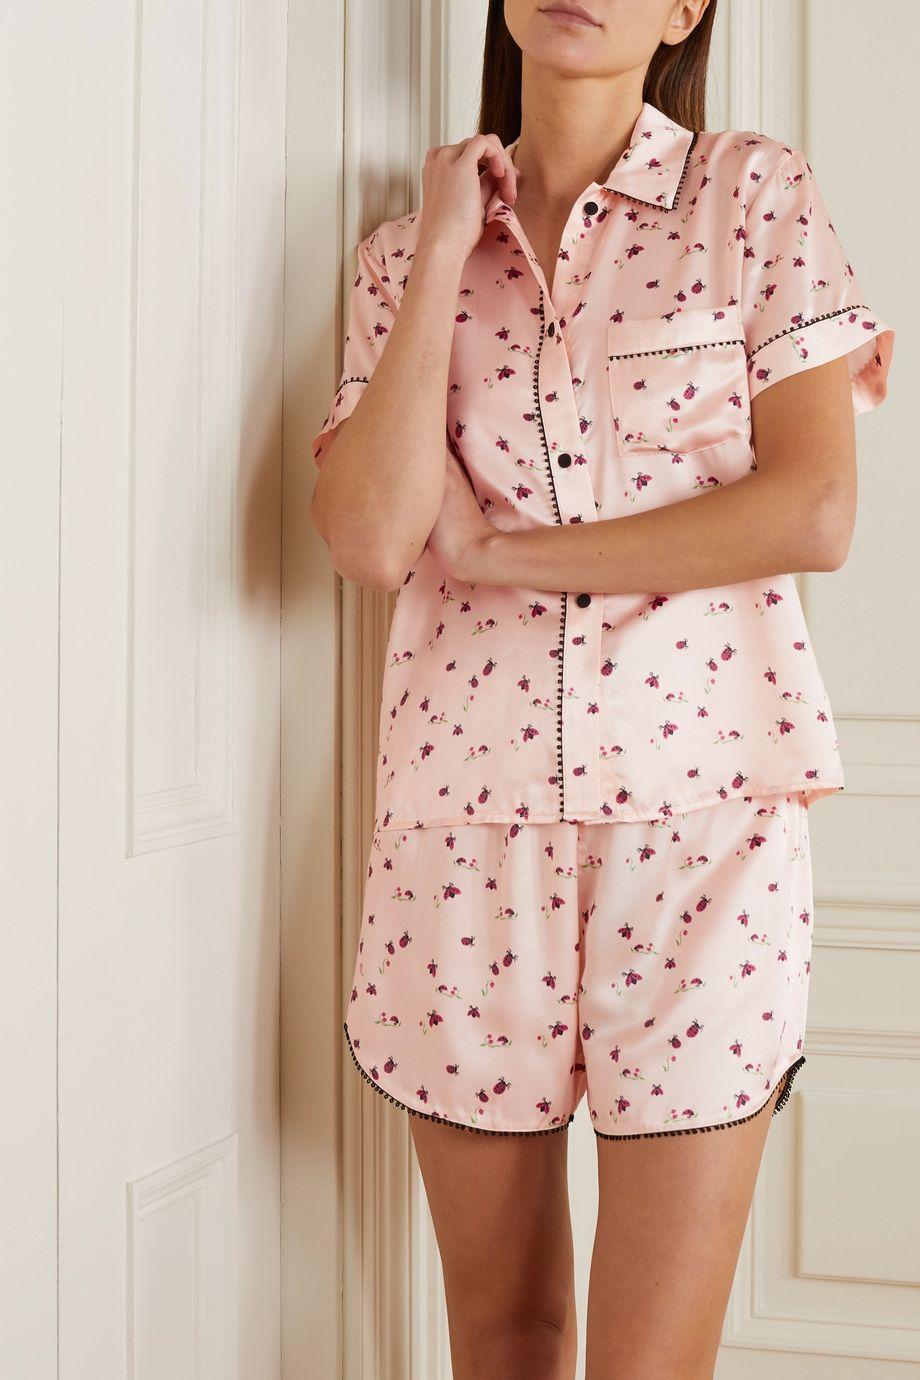 Morgan Lane Tami Bea Pyjama aus bedrucktem Satin